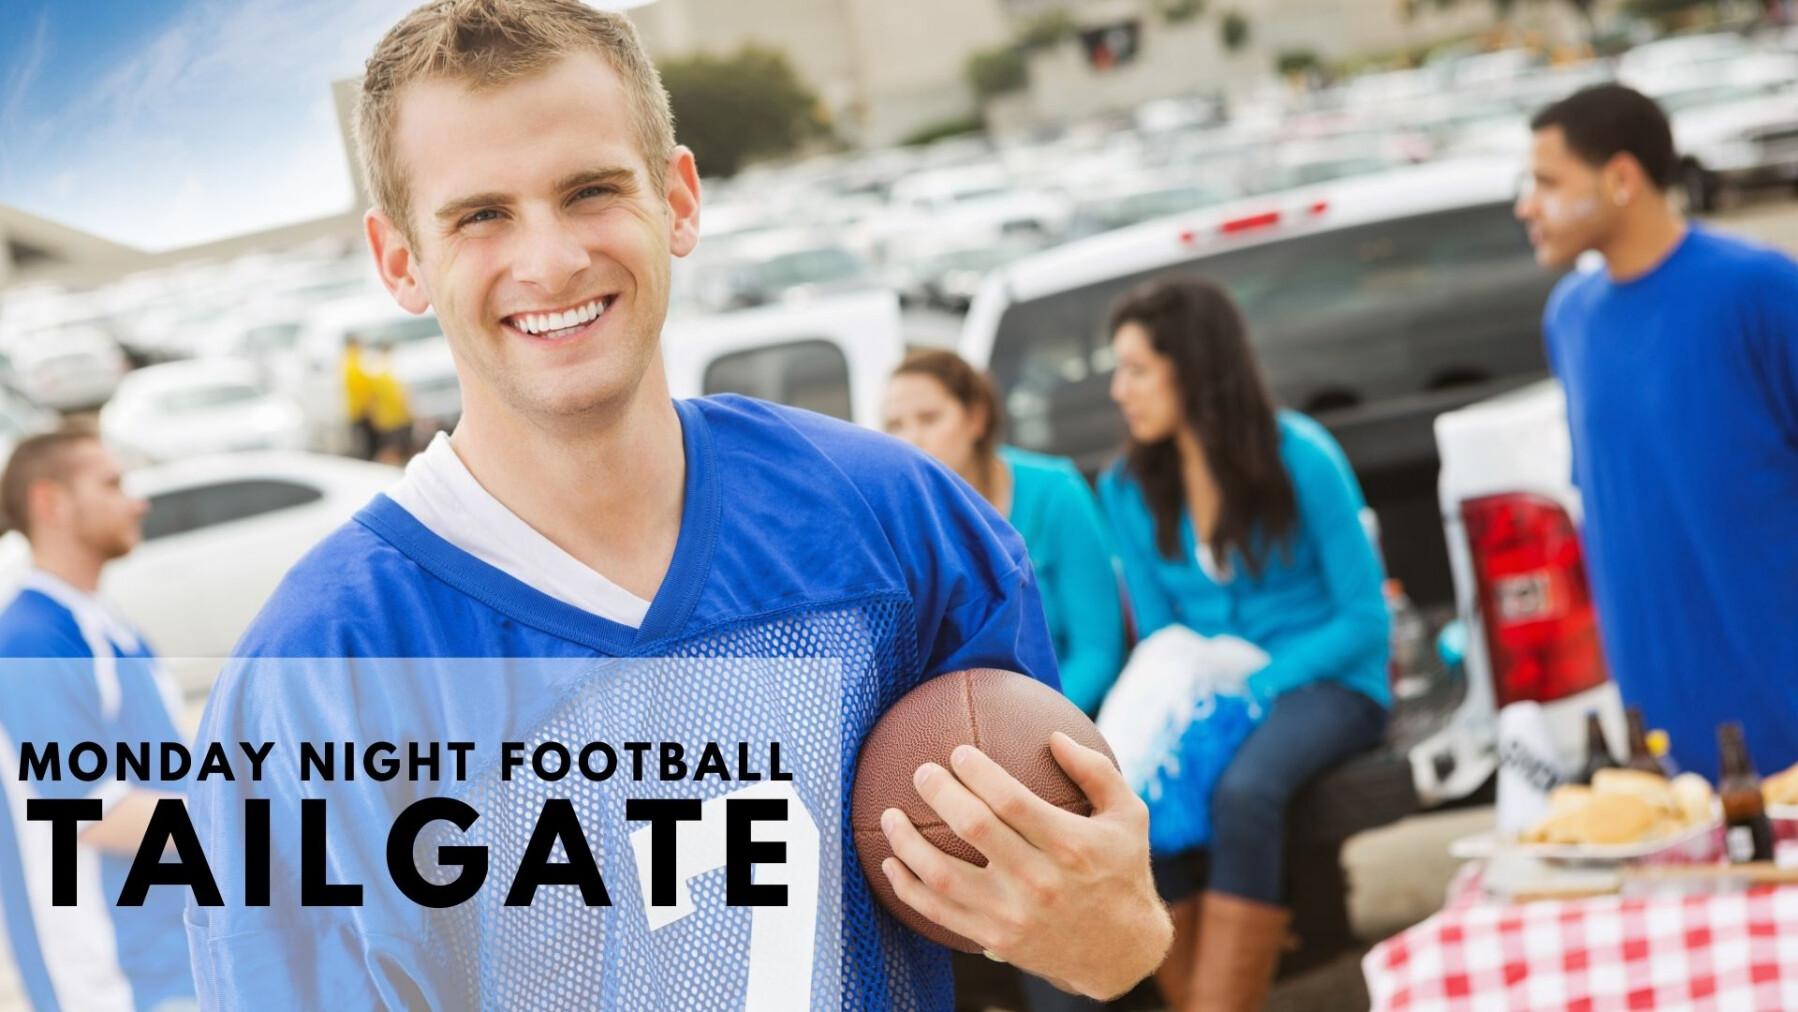 Monday Night Football Tailgate